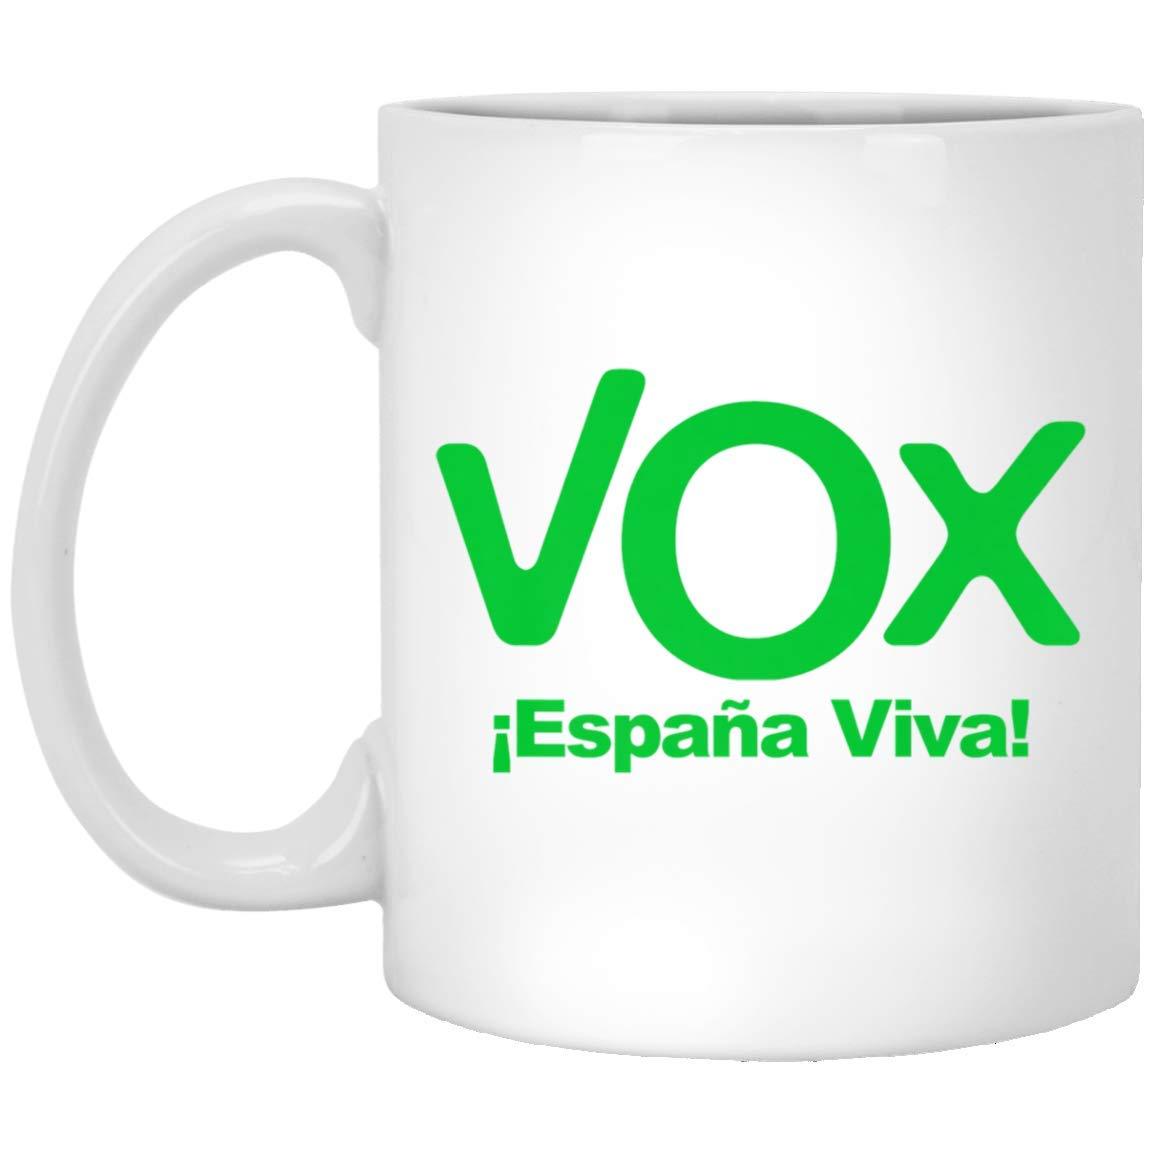 VOX Espana Viva Playera Camiseta Democracia 11 oz. White Mug ...